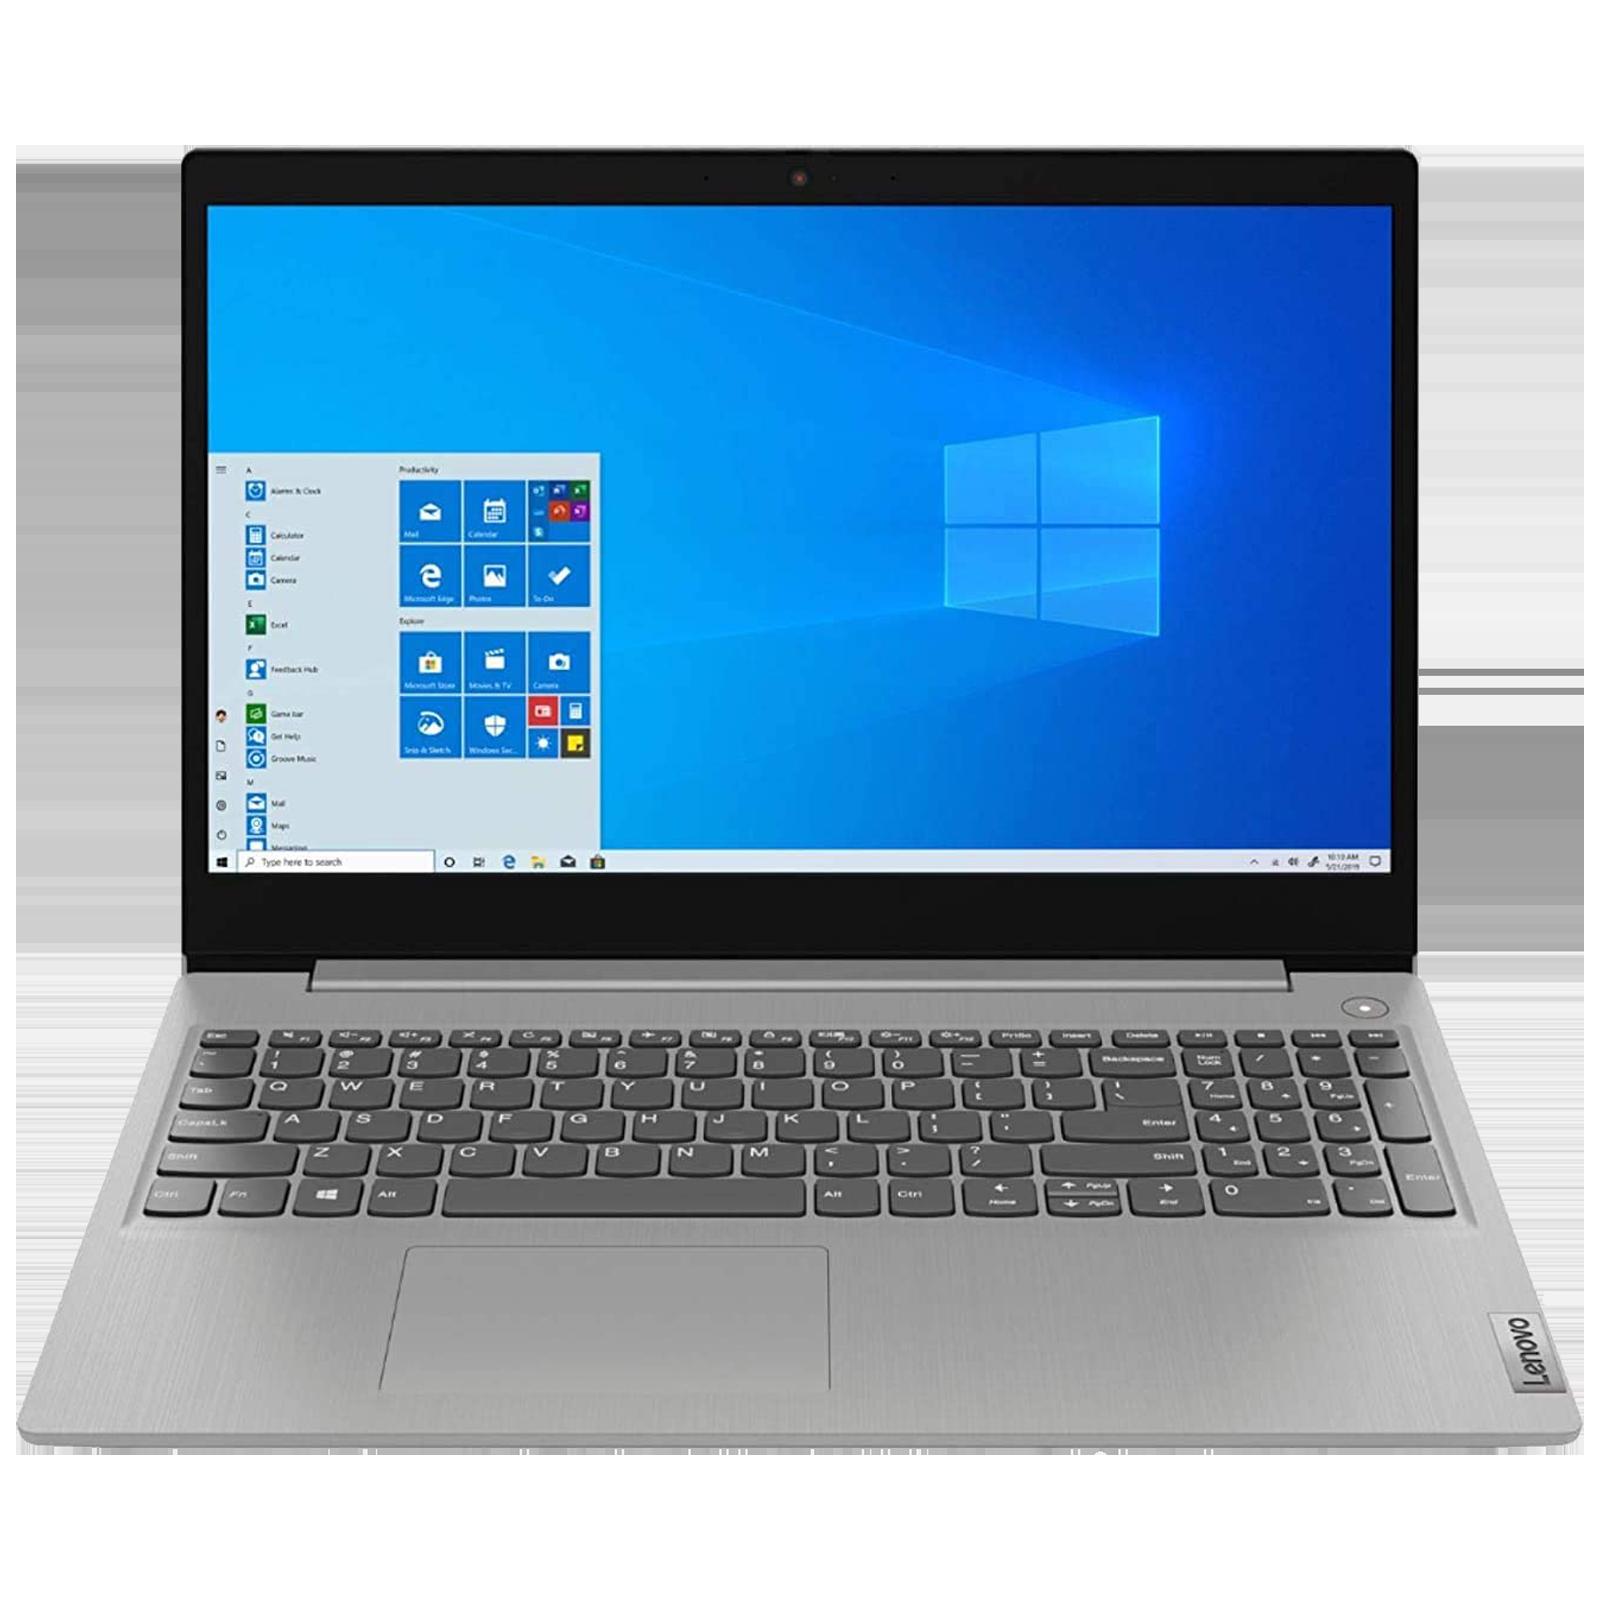 Lenovo Slim 3 (81WB0113IN) Core i3 10th Gen Windows 10 Home Thin and Light Laptop (4GB RAM, 256GB SSD, Intel UHD Graphics, MS Office, 39.62cm, Platinum Grey)_4